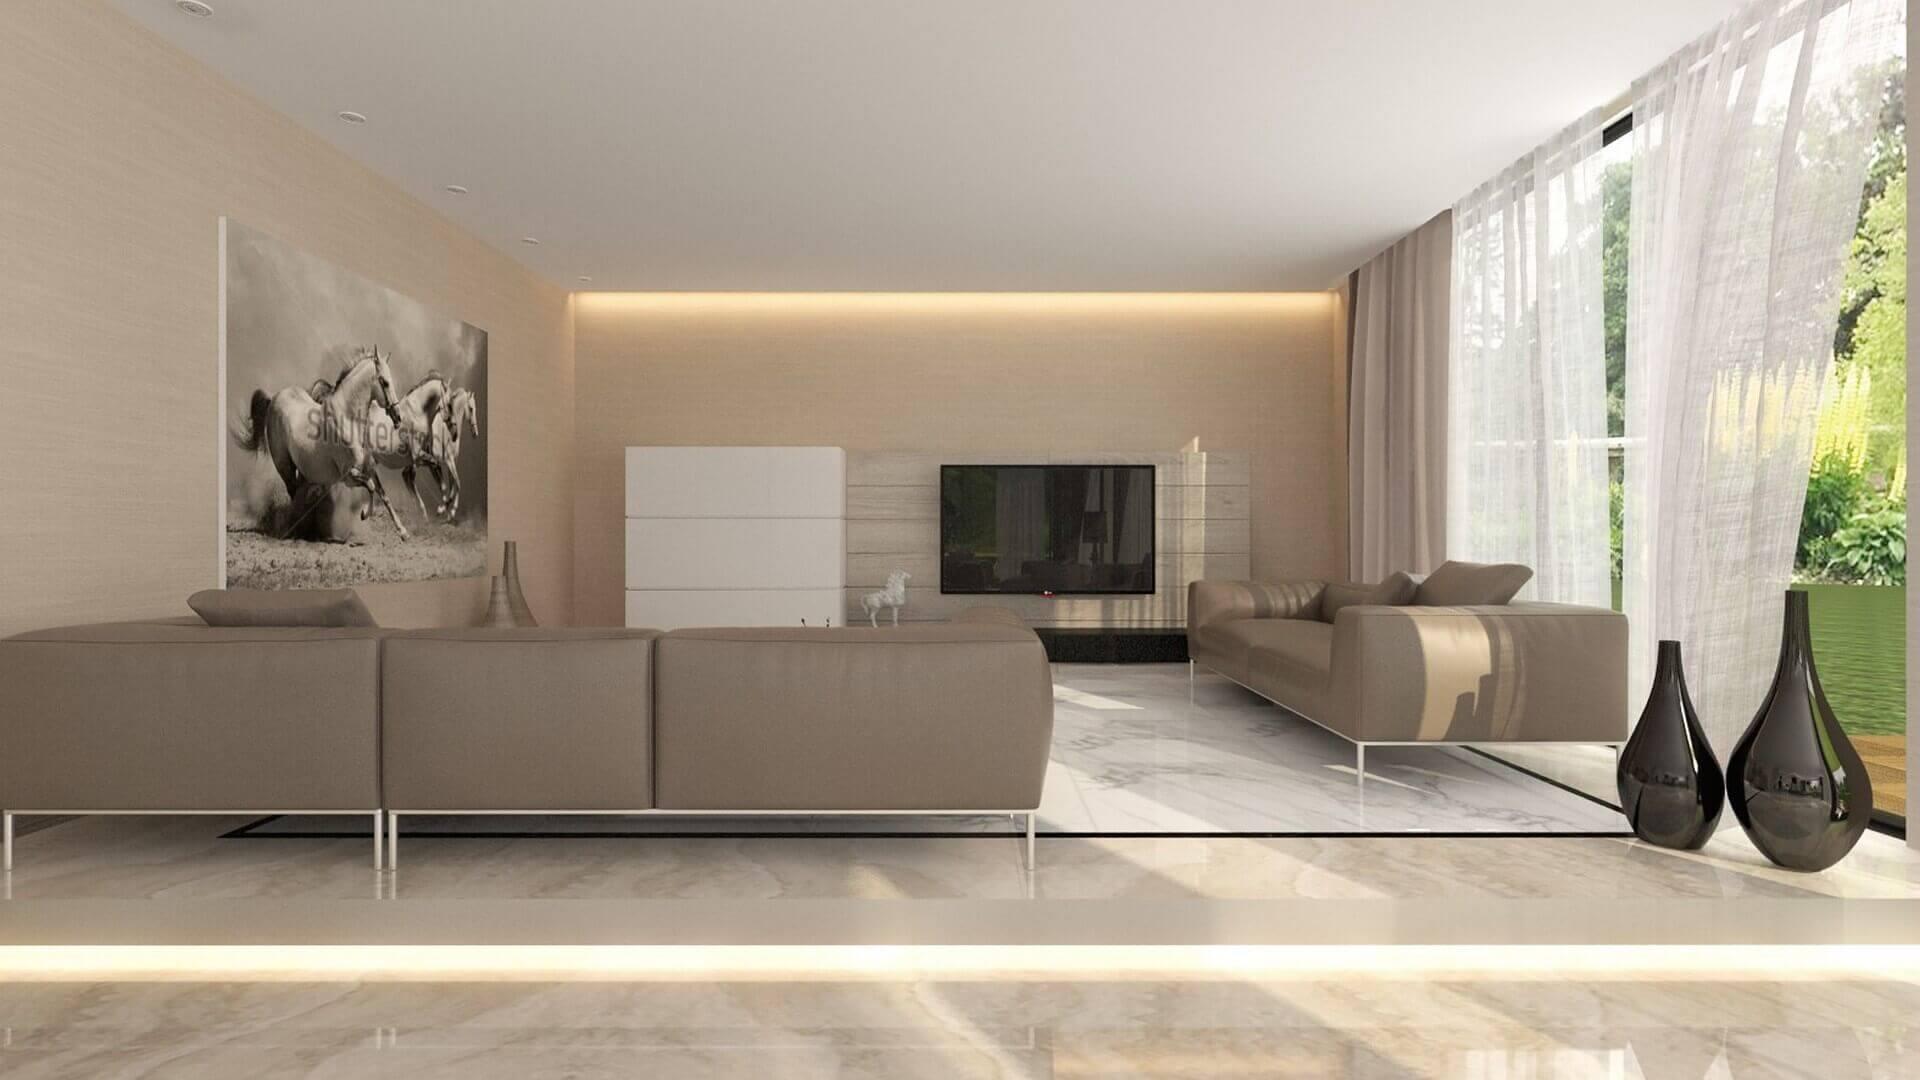 Vantage umitkoy interior designer 2821 Private Project Residential